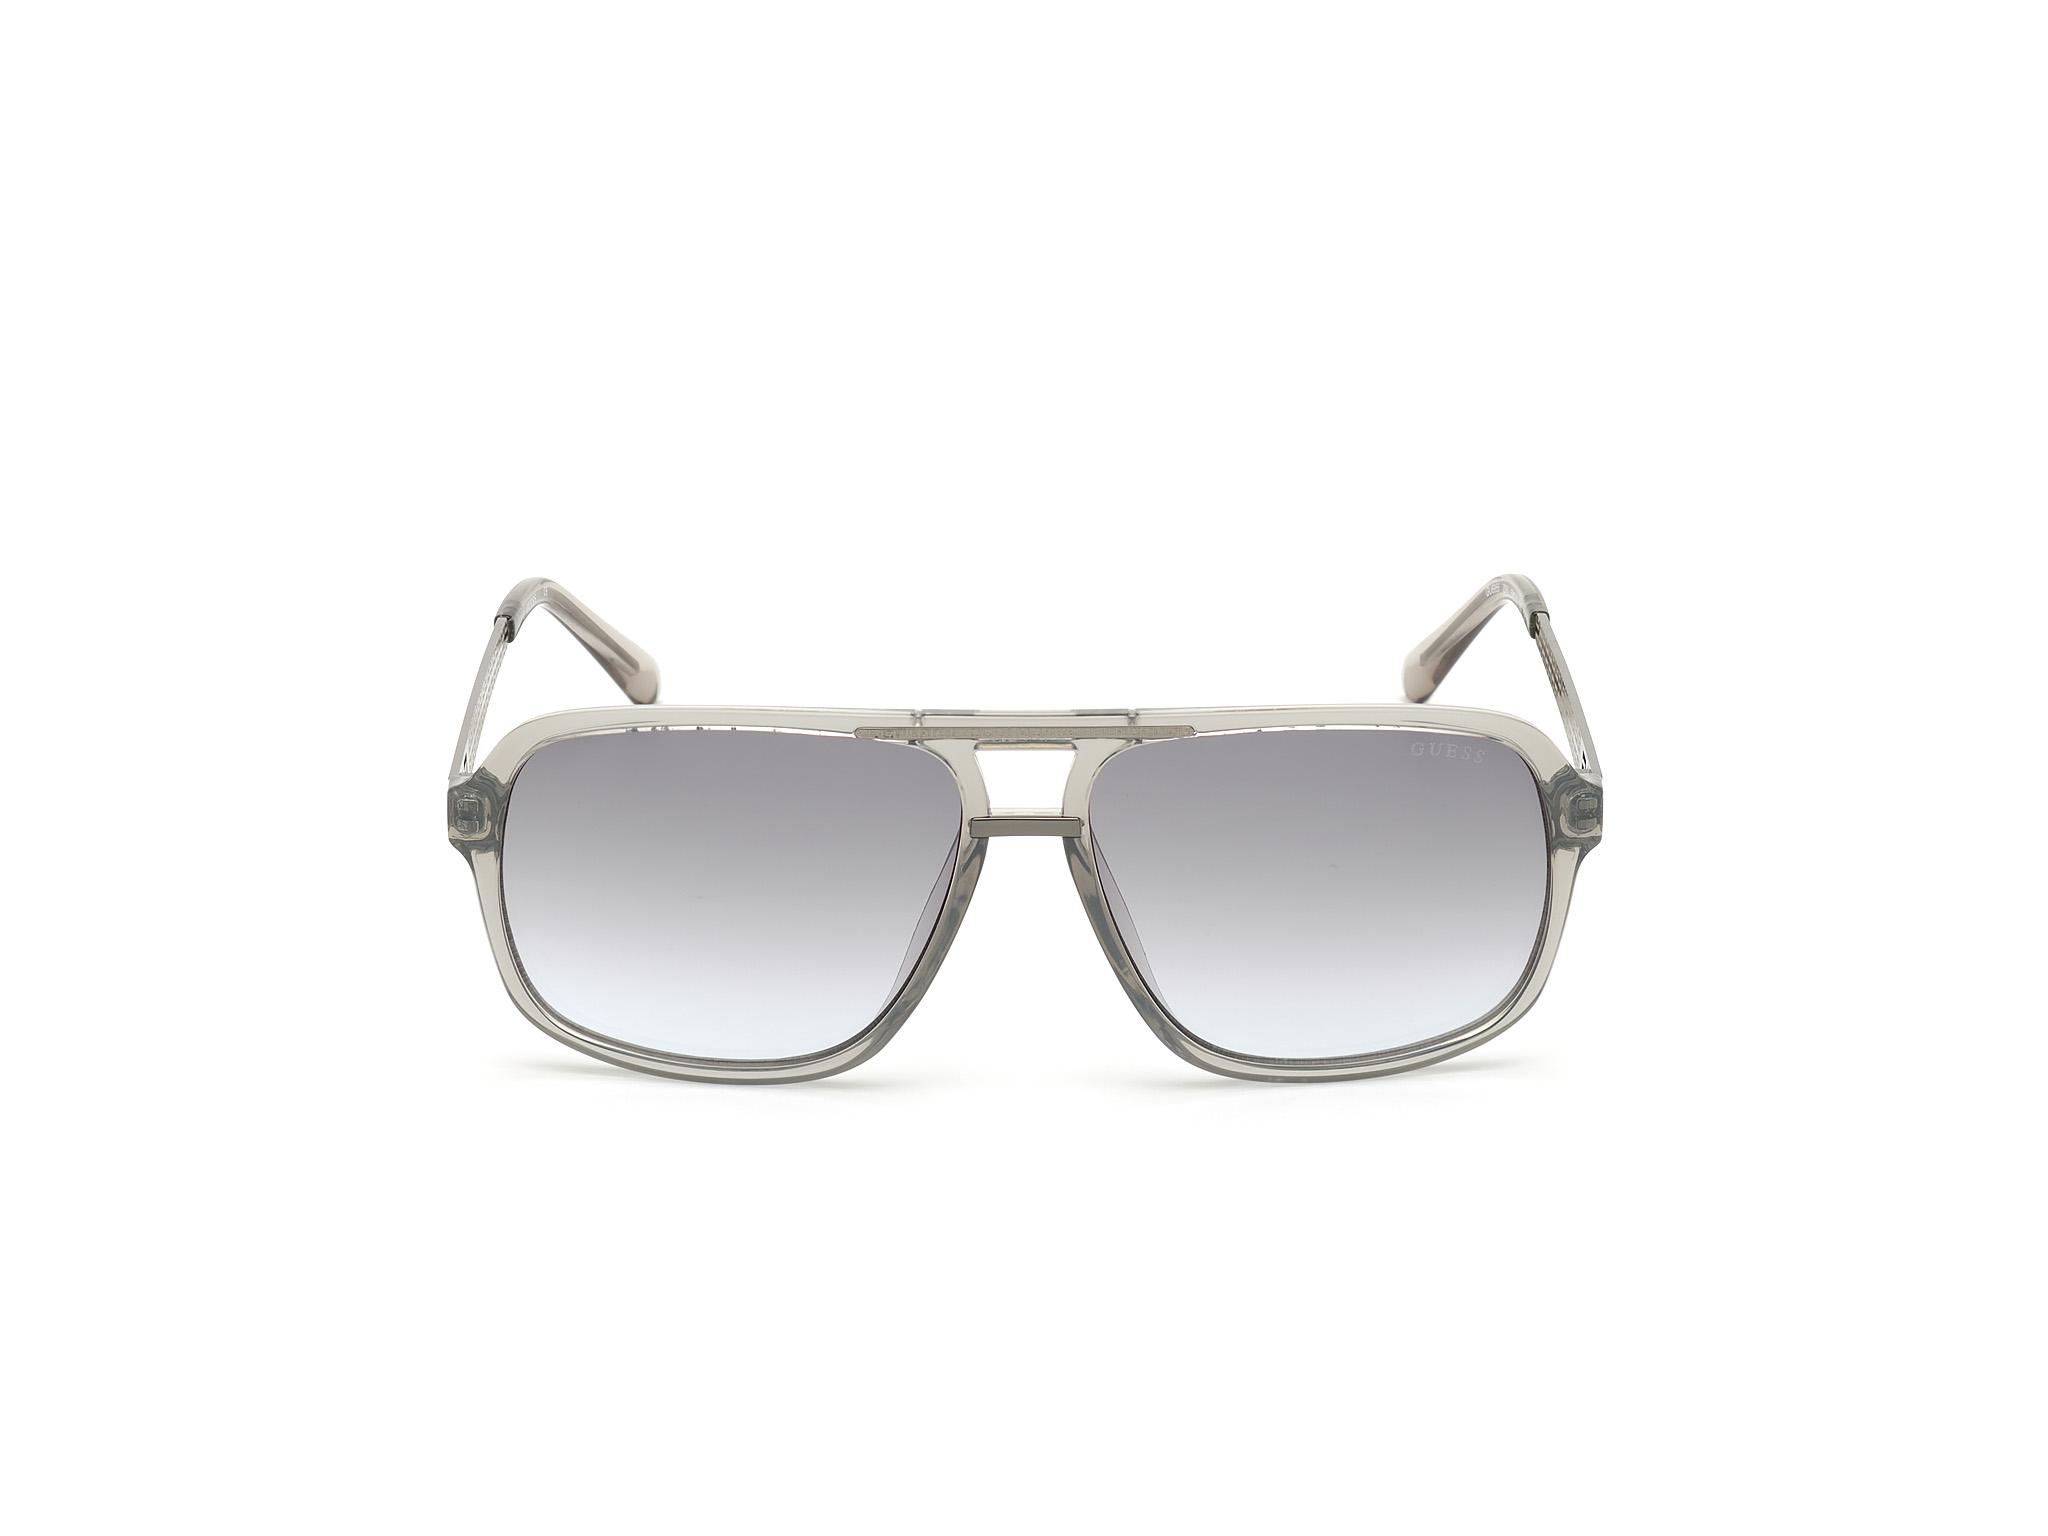 GUESS | Guess Grey Frame With Grey Lens Shield Shape Men Sunglass